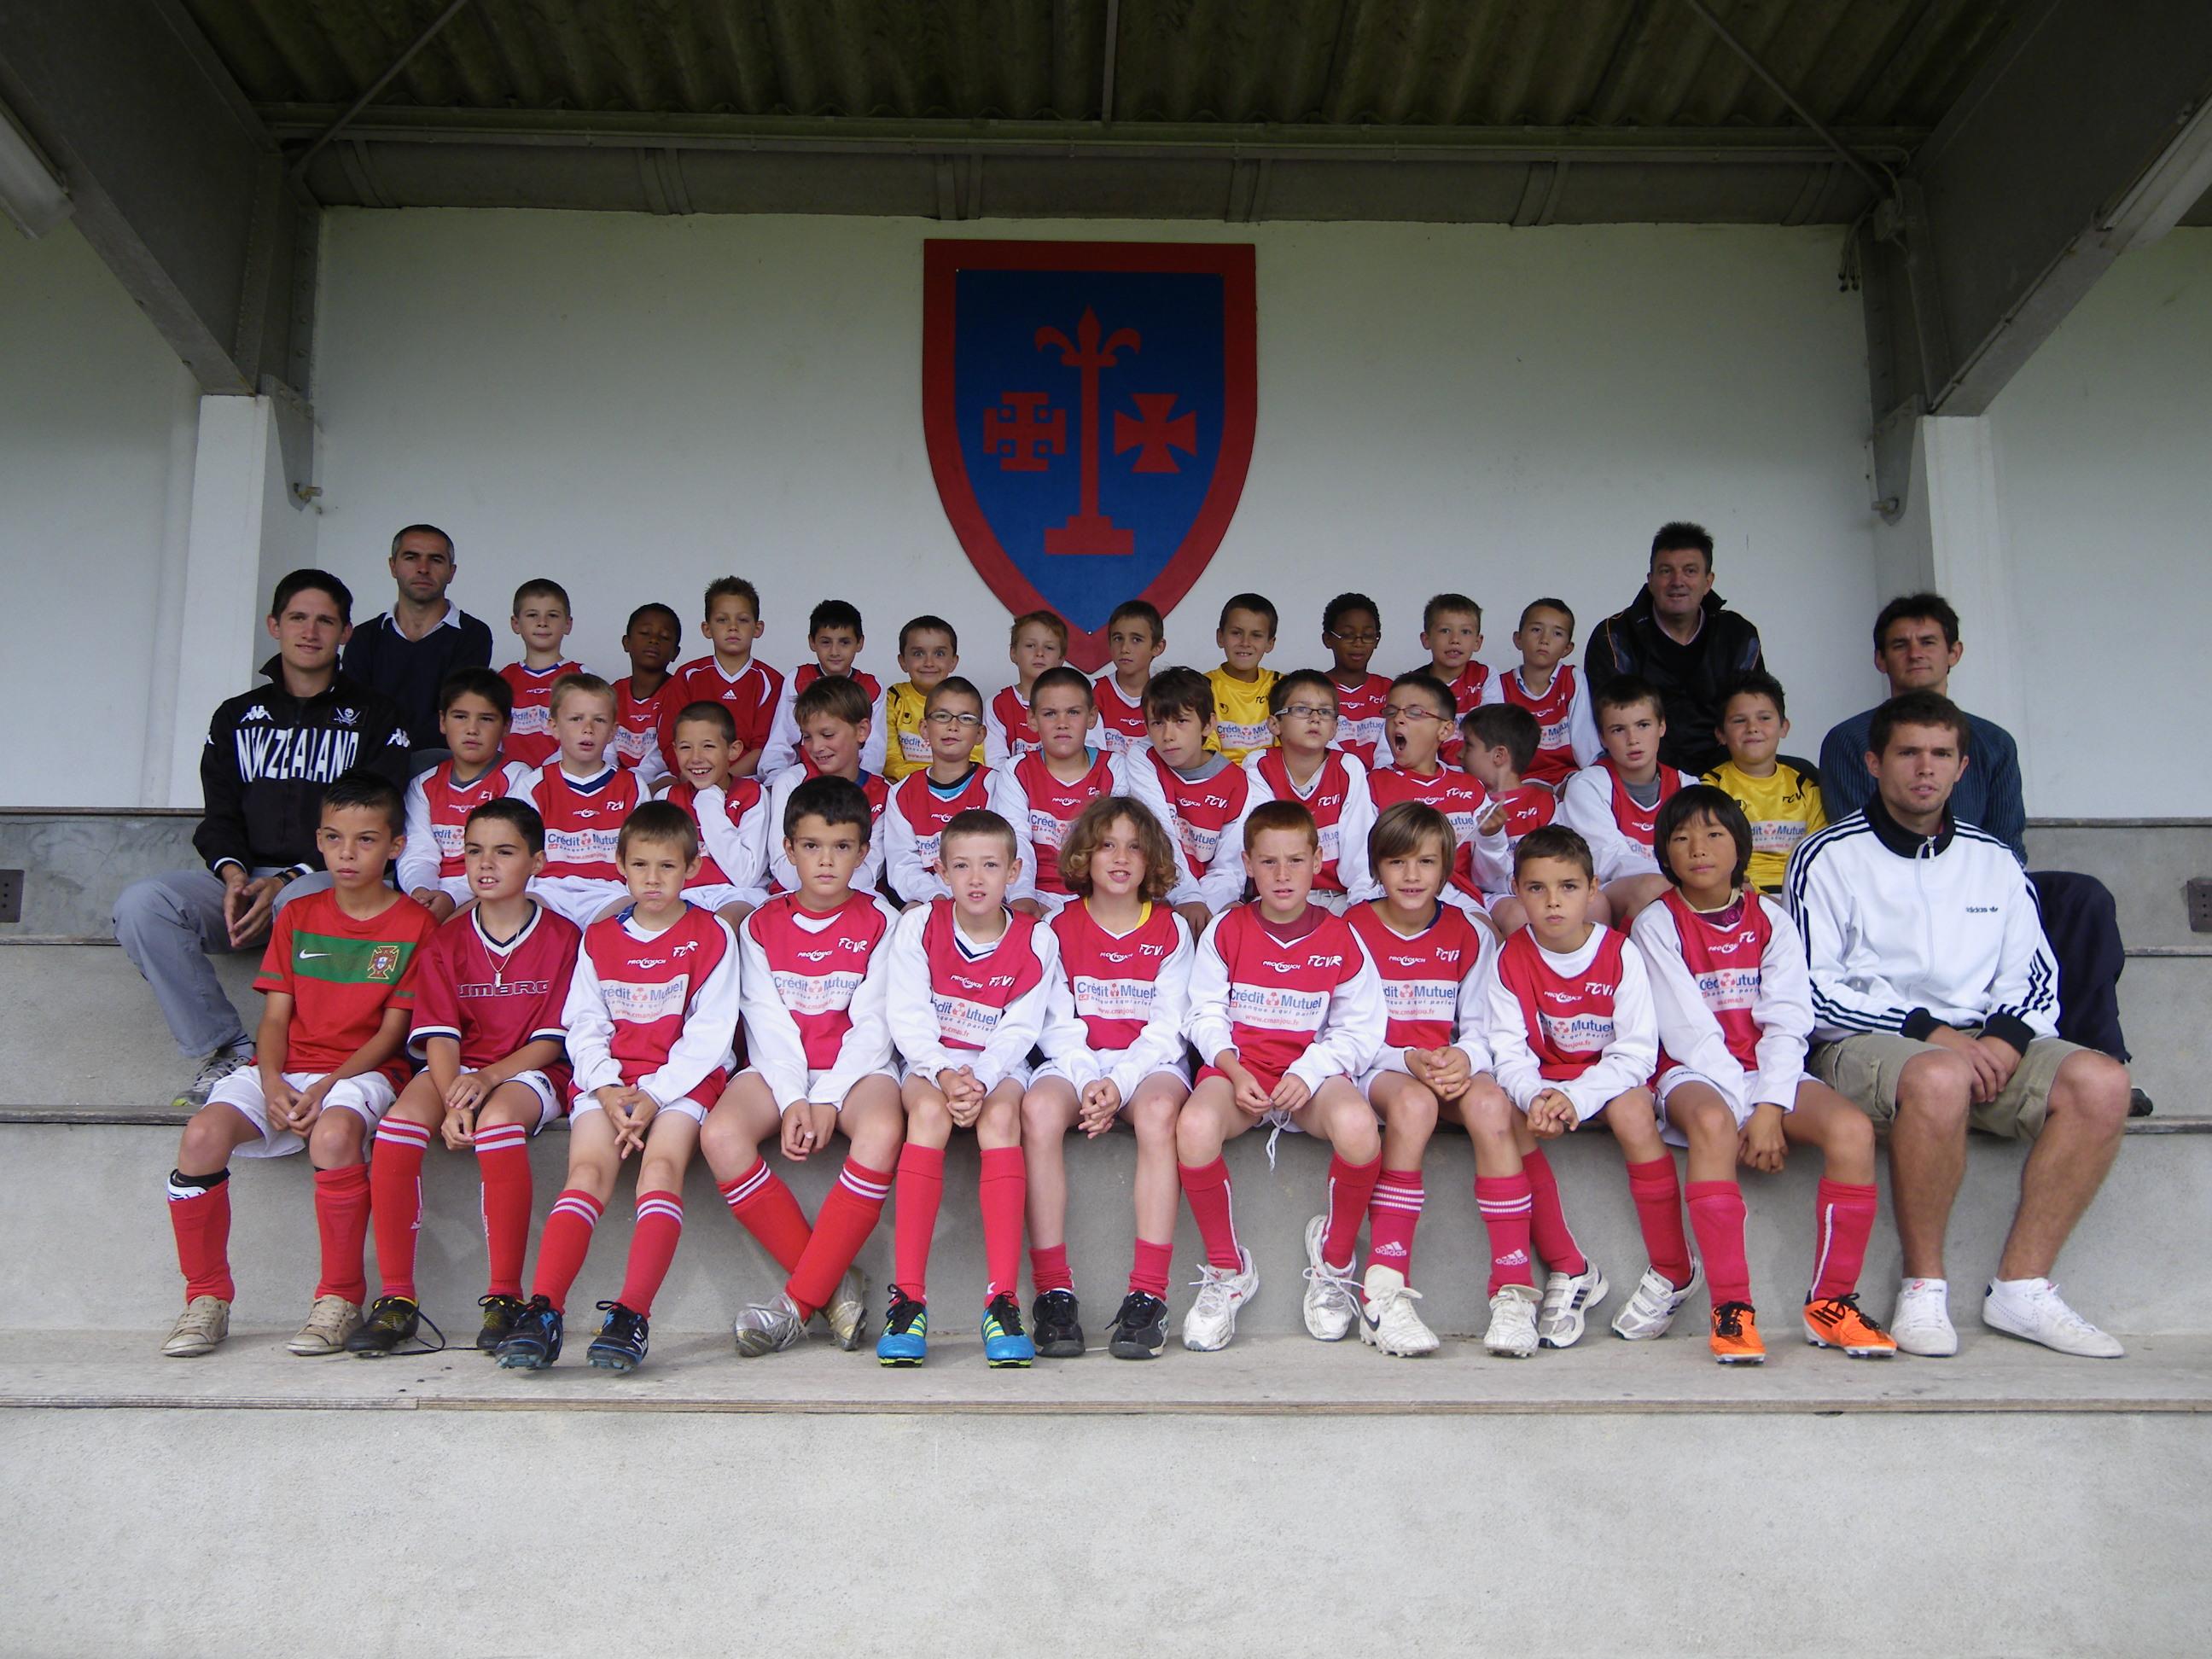 equipe 2011 2012 poussins